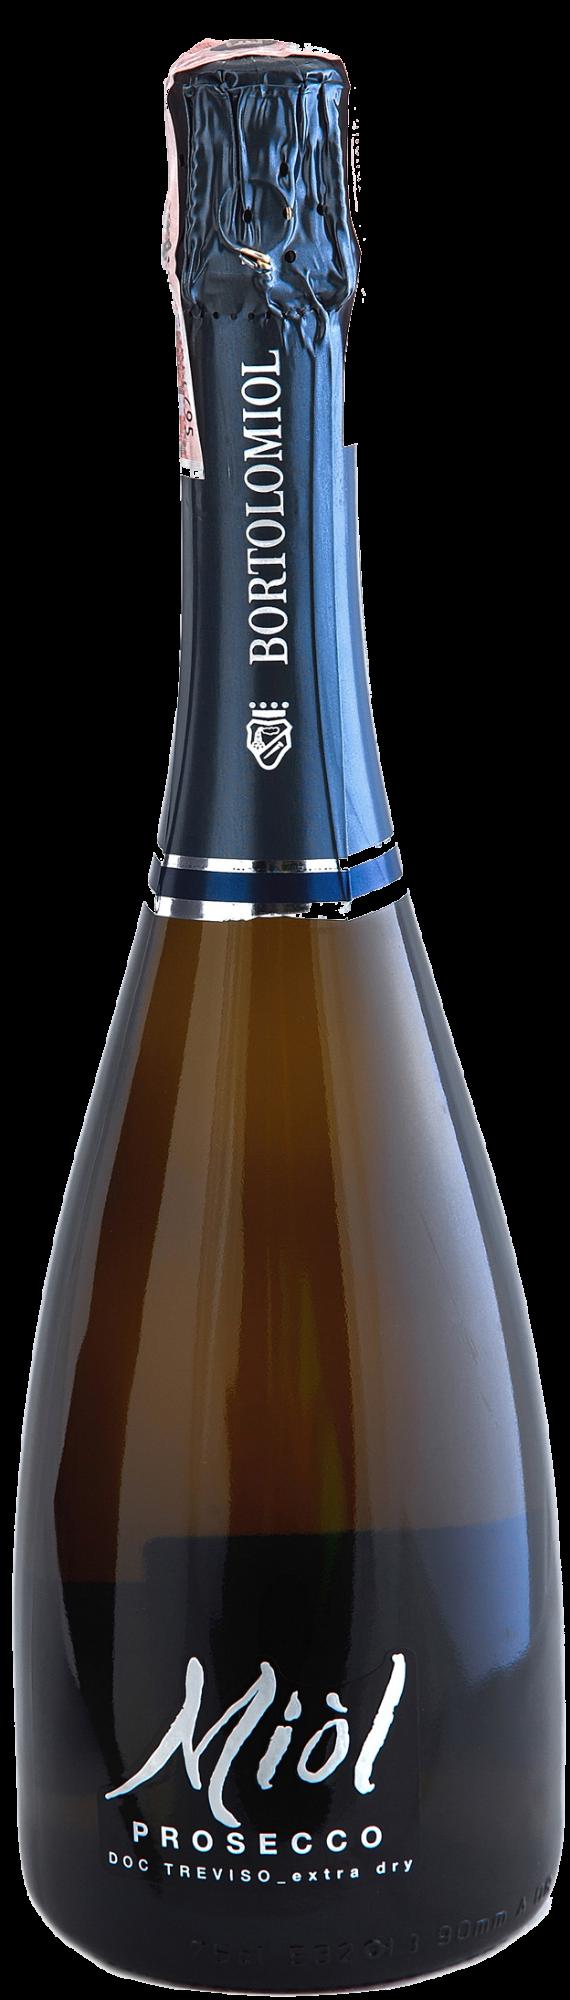 Miol Prosecco Treviso Extra Dry winewine магазин-склад